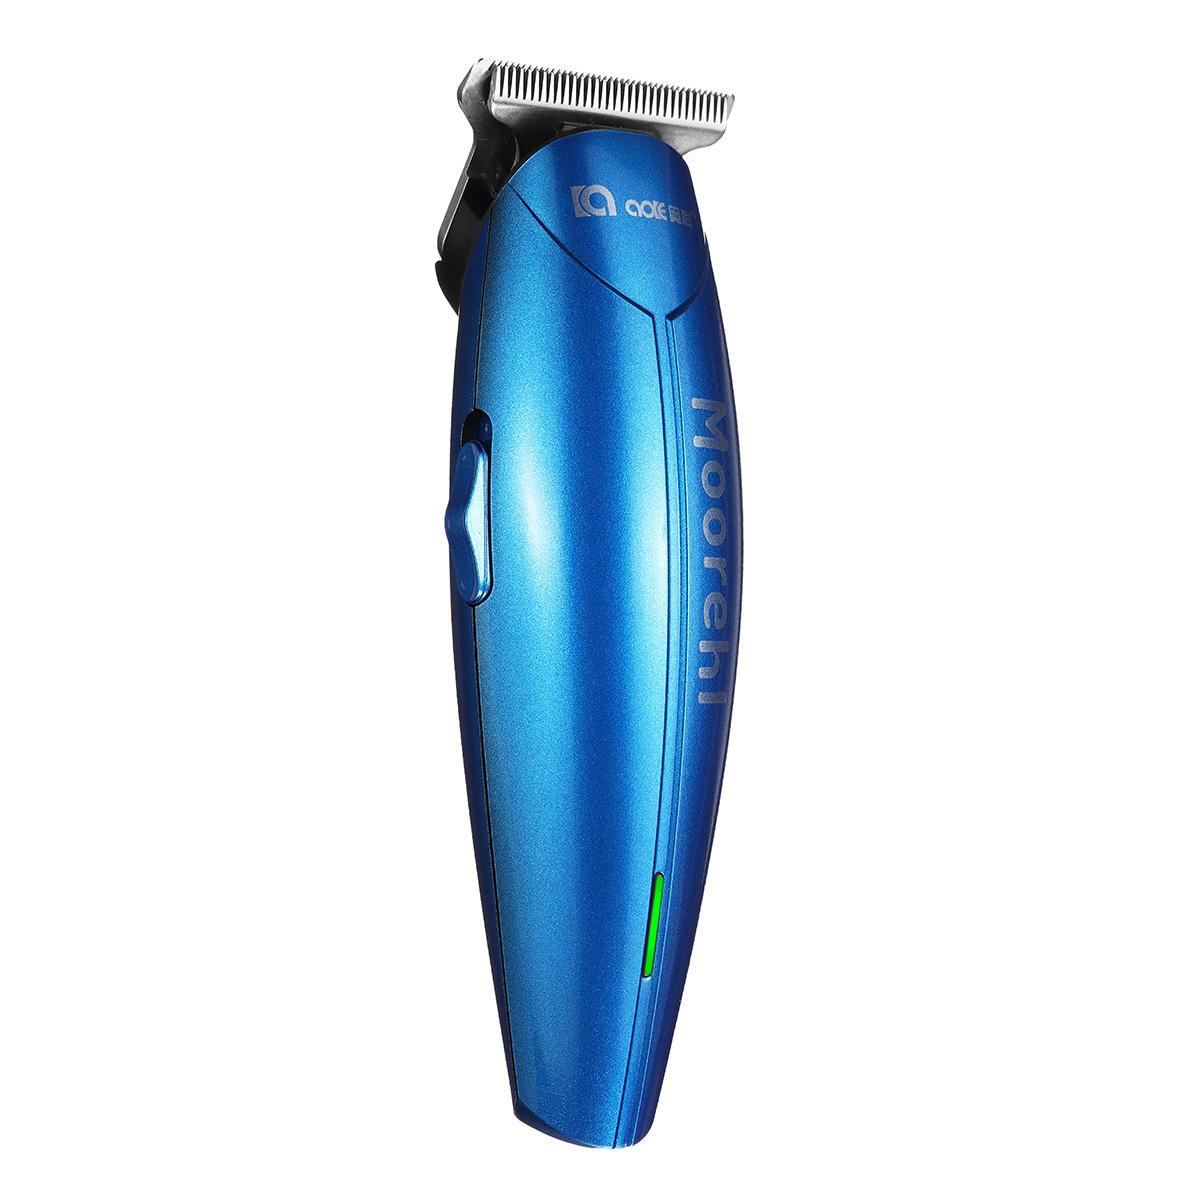 Kemei KM-5027 Cordless Rechargeable Hair Clipper LCD Hair Trimmer Hair Cutting Kits - 3